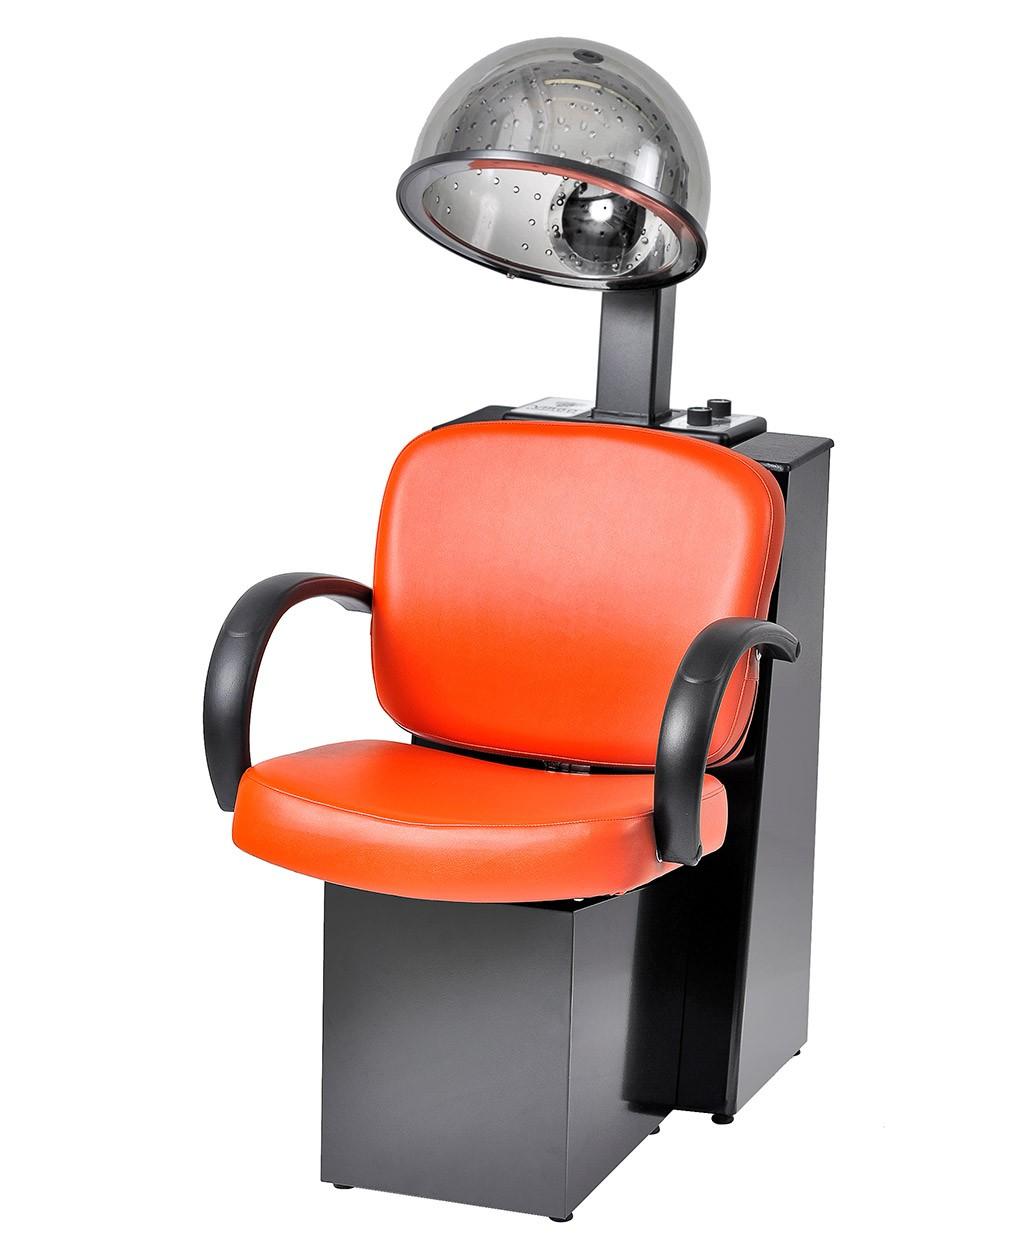 Pibbs 3669 Messina Dryer Chair